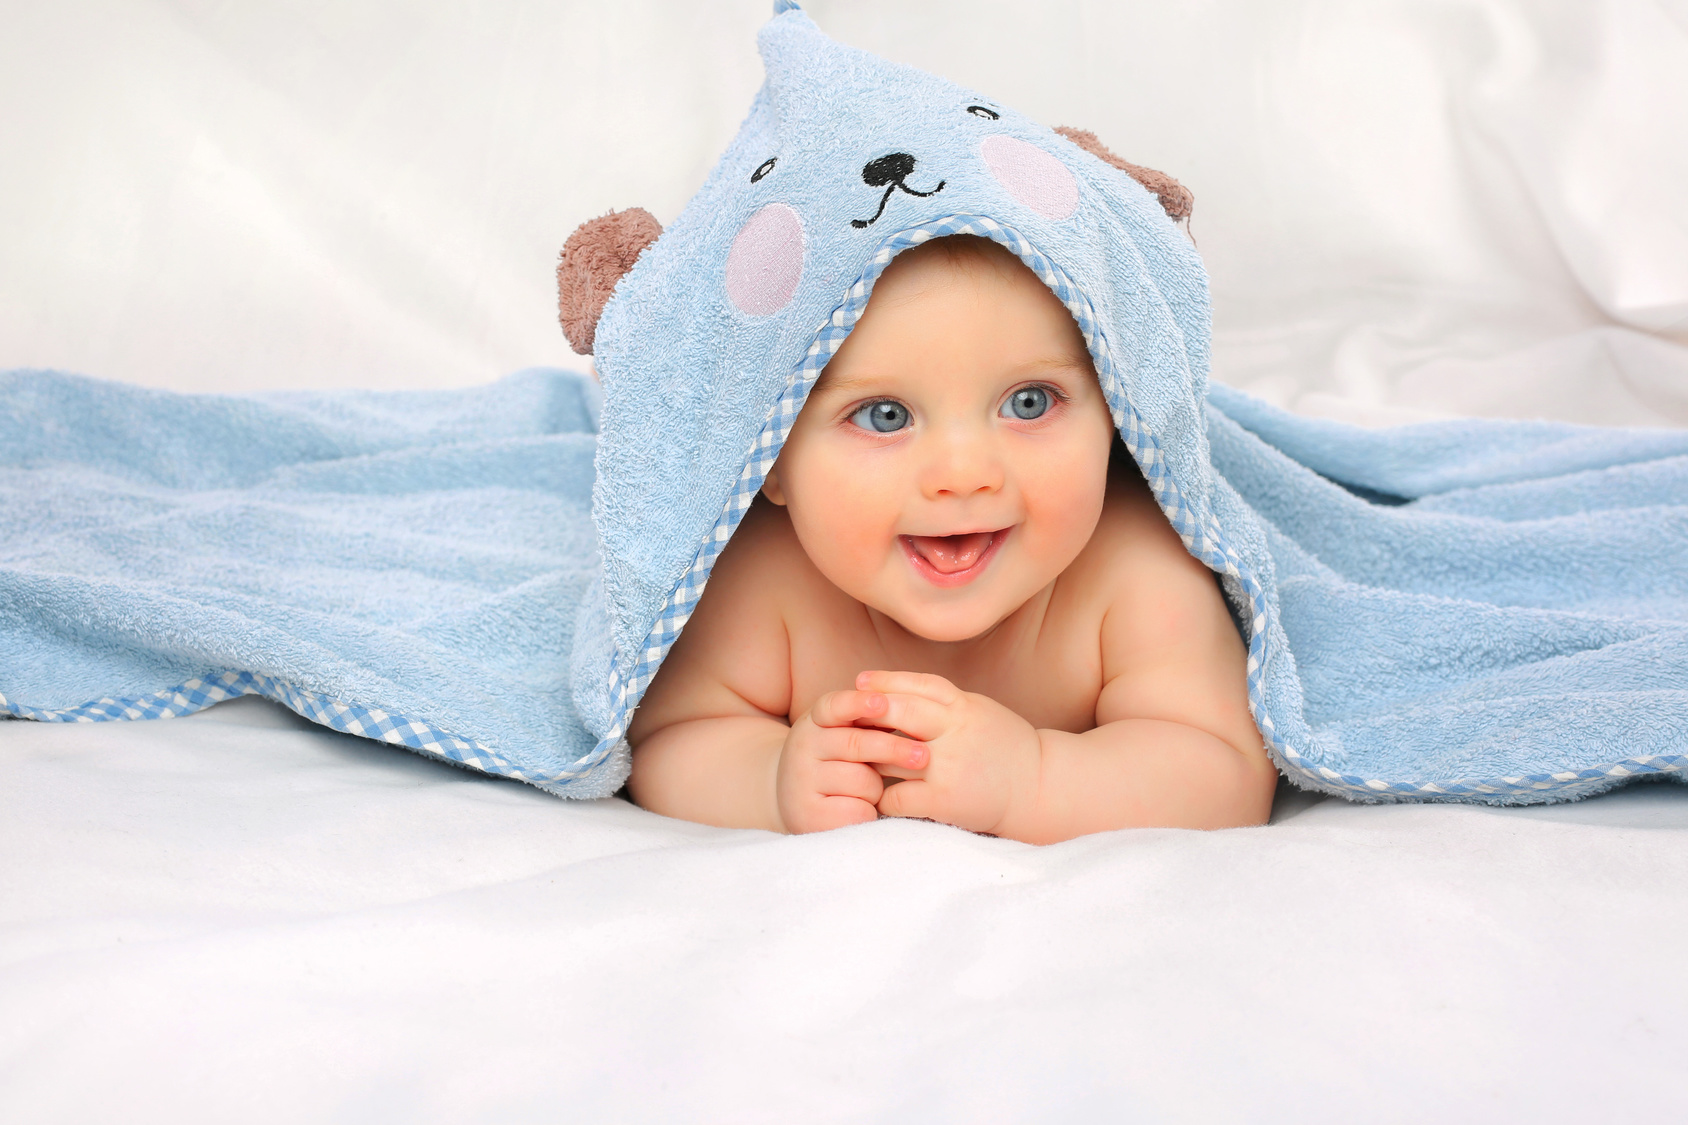 Blue eye baby - genetic testing designer babies